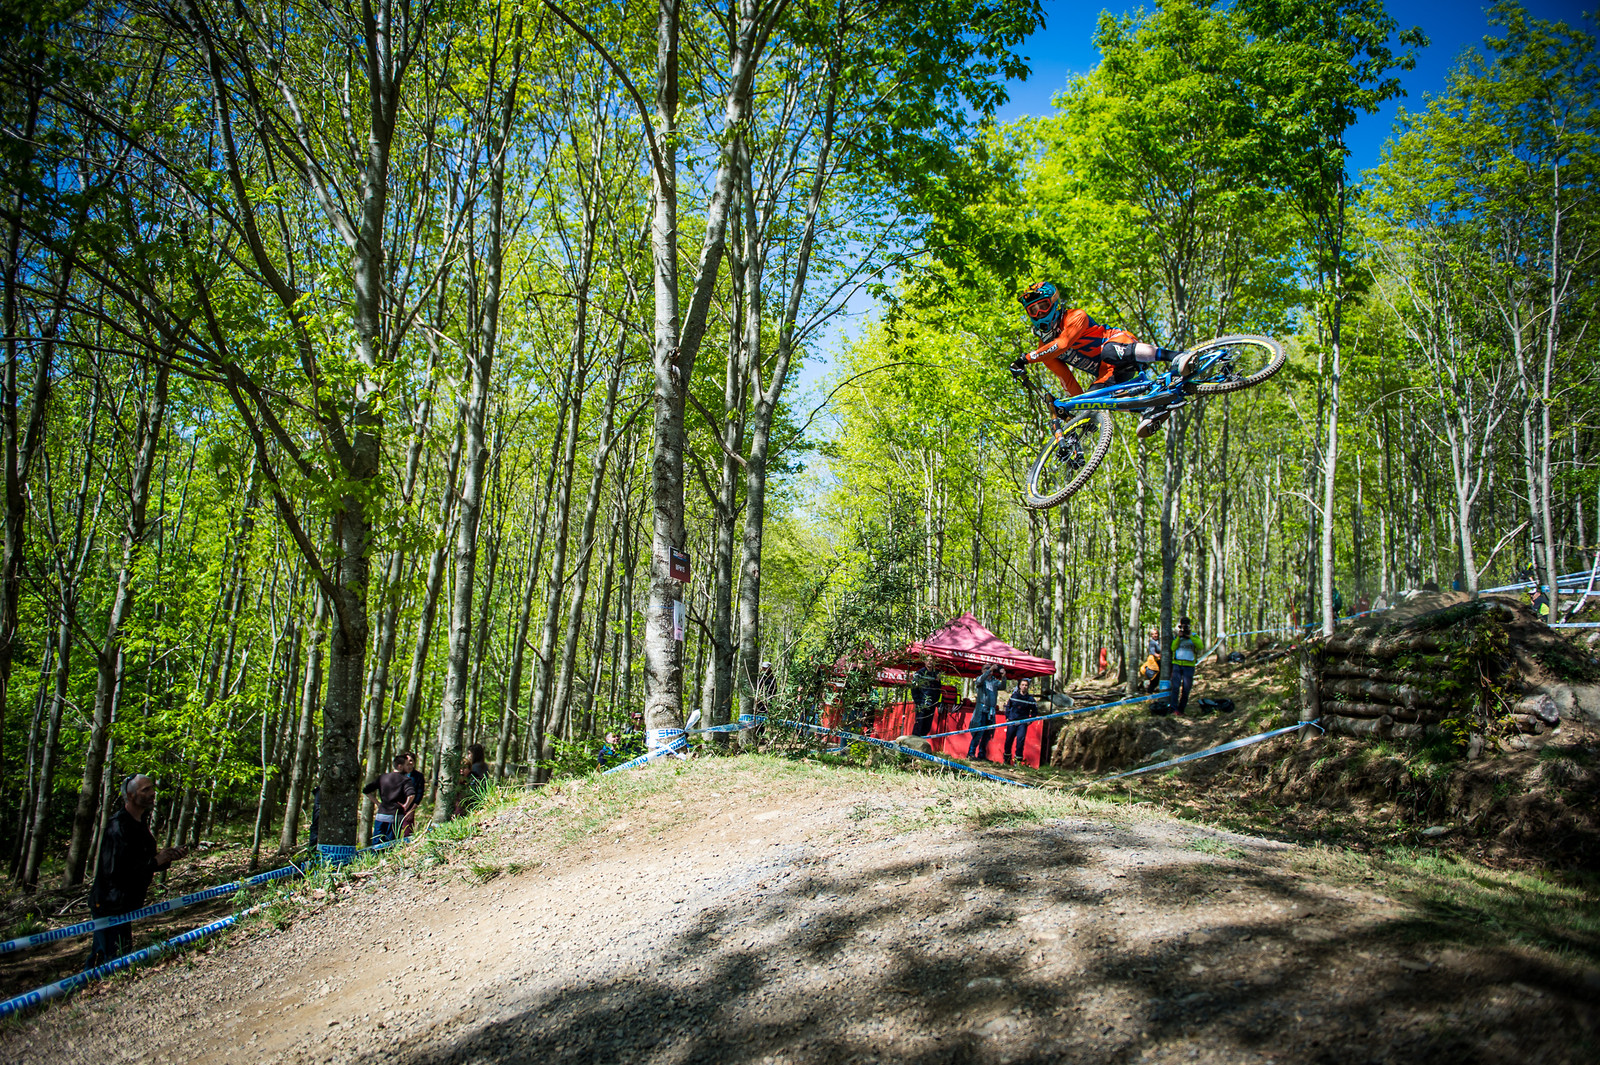 Bernard Kerr - iceman2058 - Mountain Biking Pictures - Vital MTB